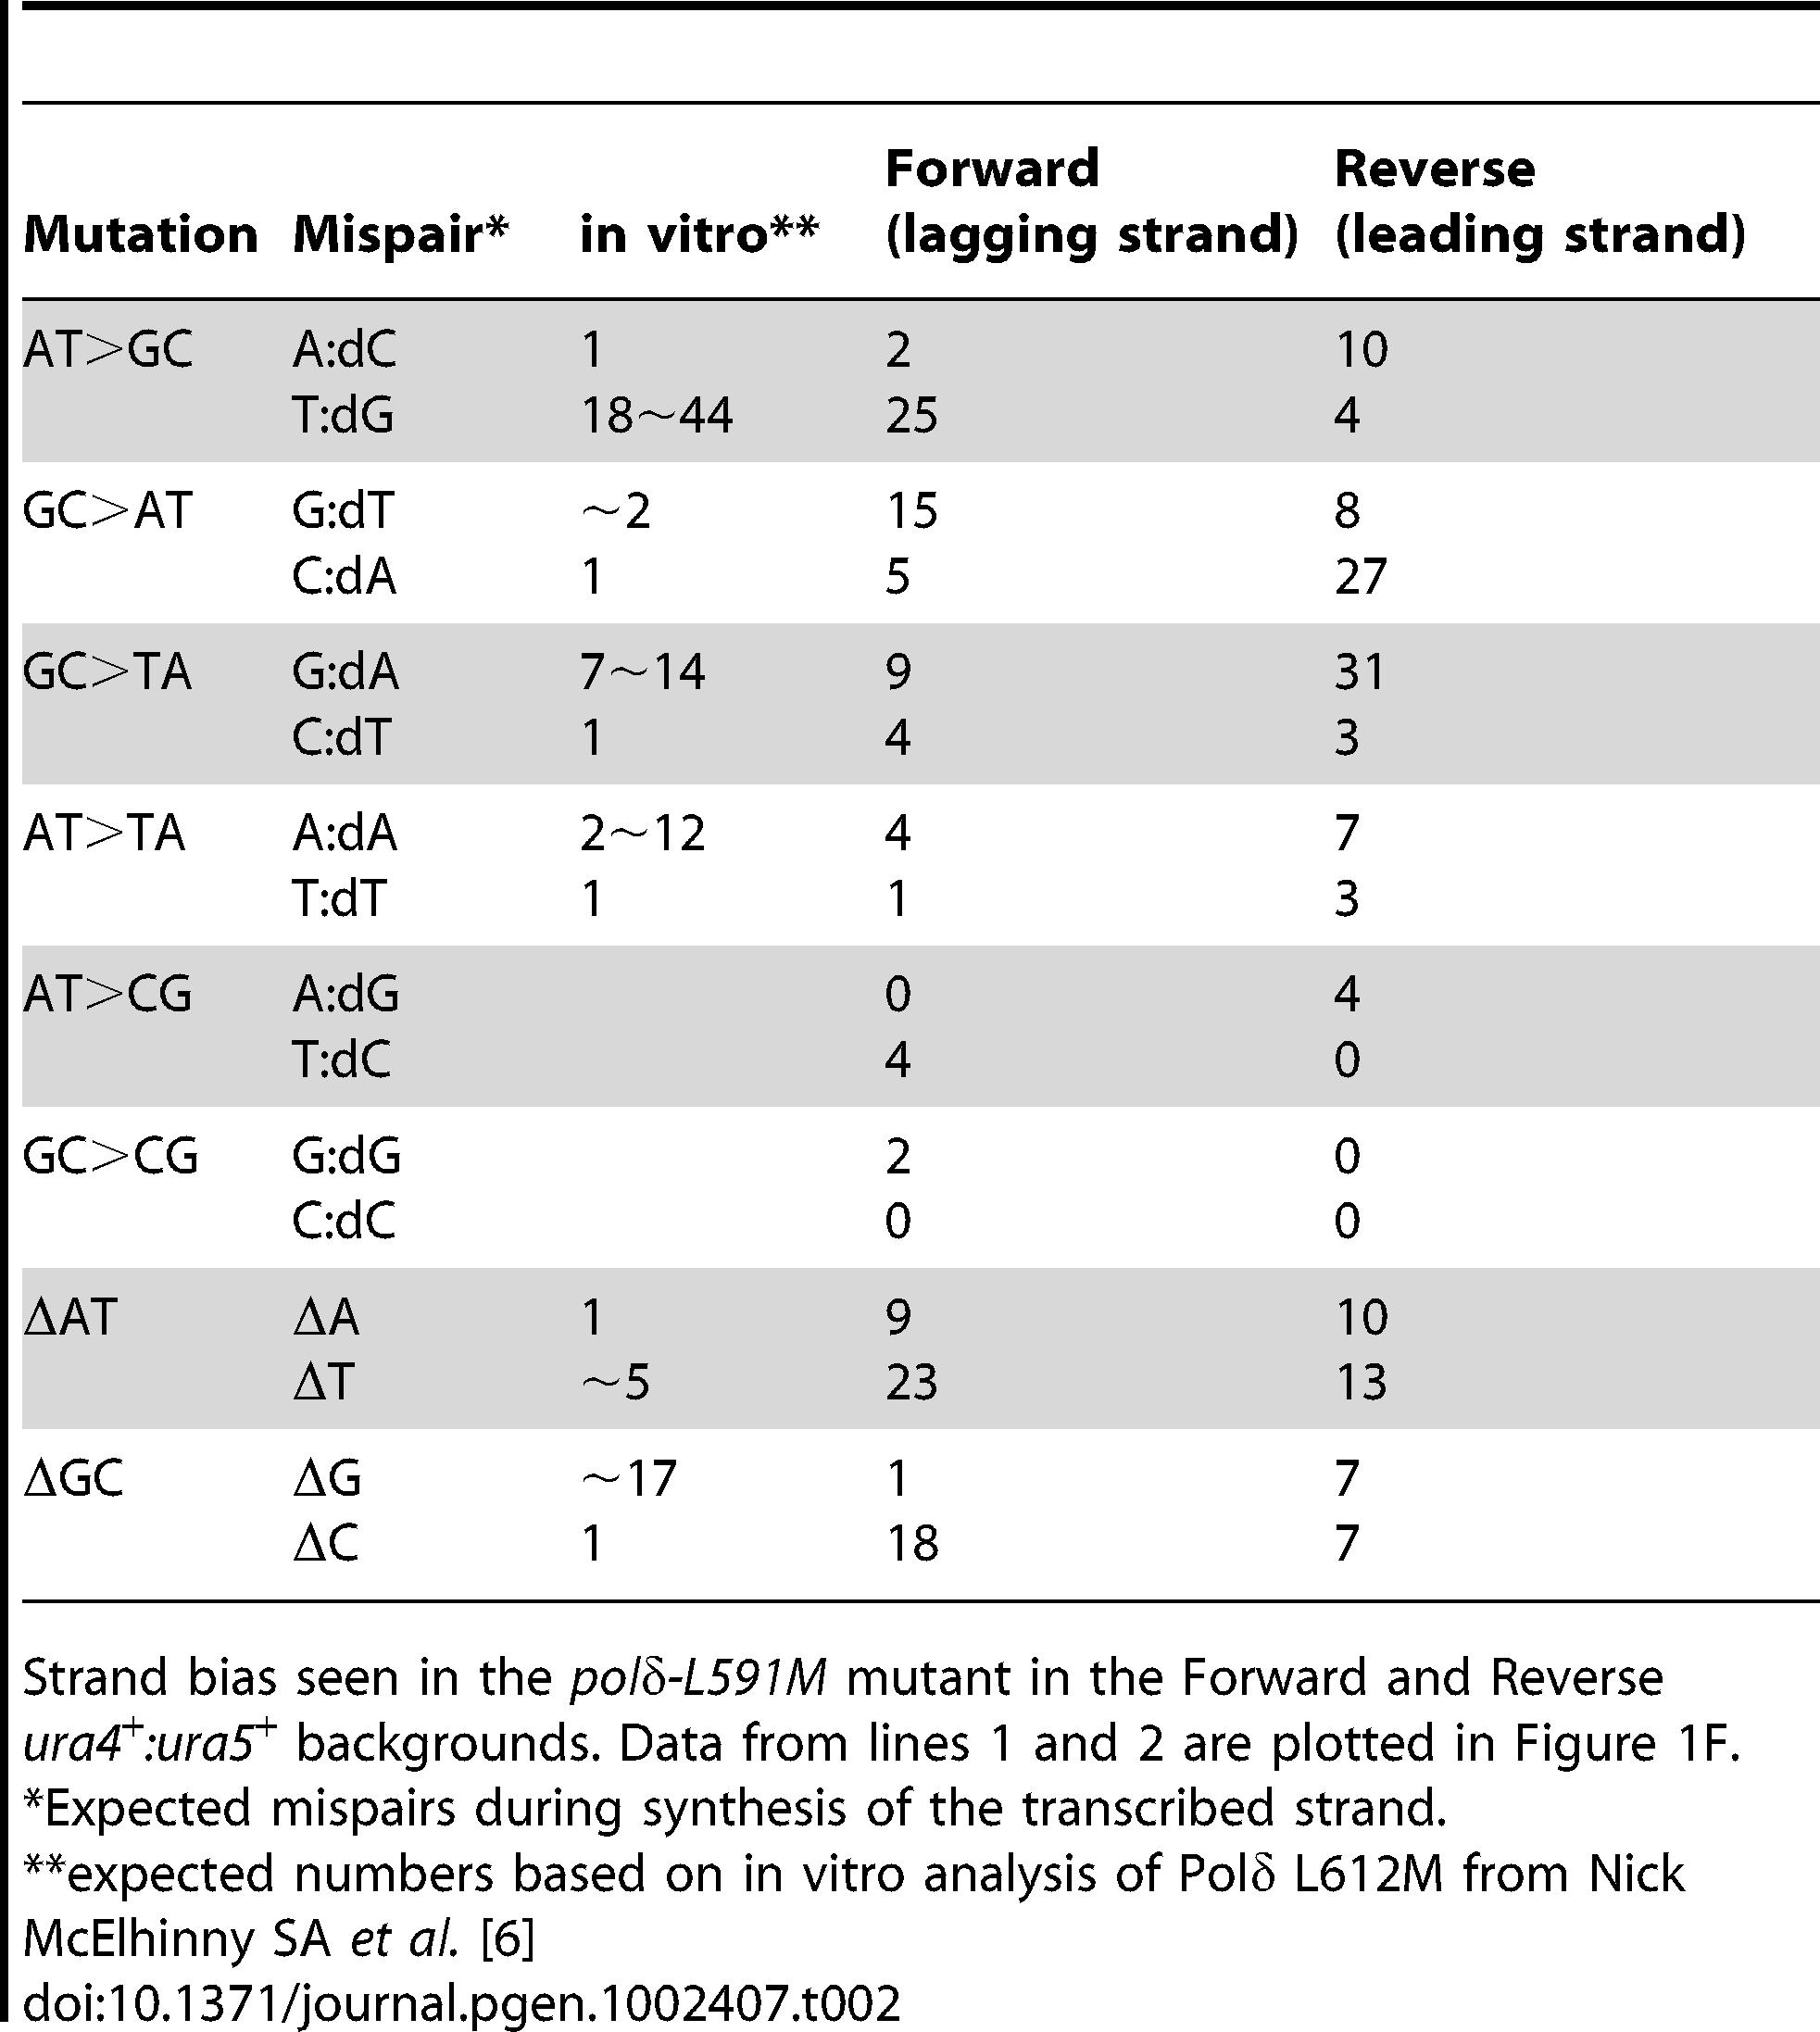 Strand bias of mutants from <i>polδ-L591M.</i>